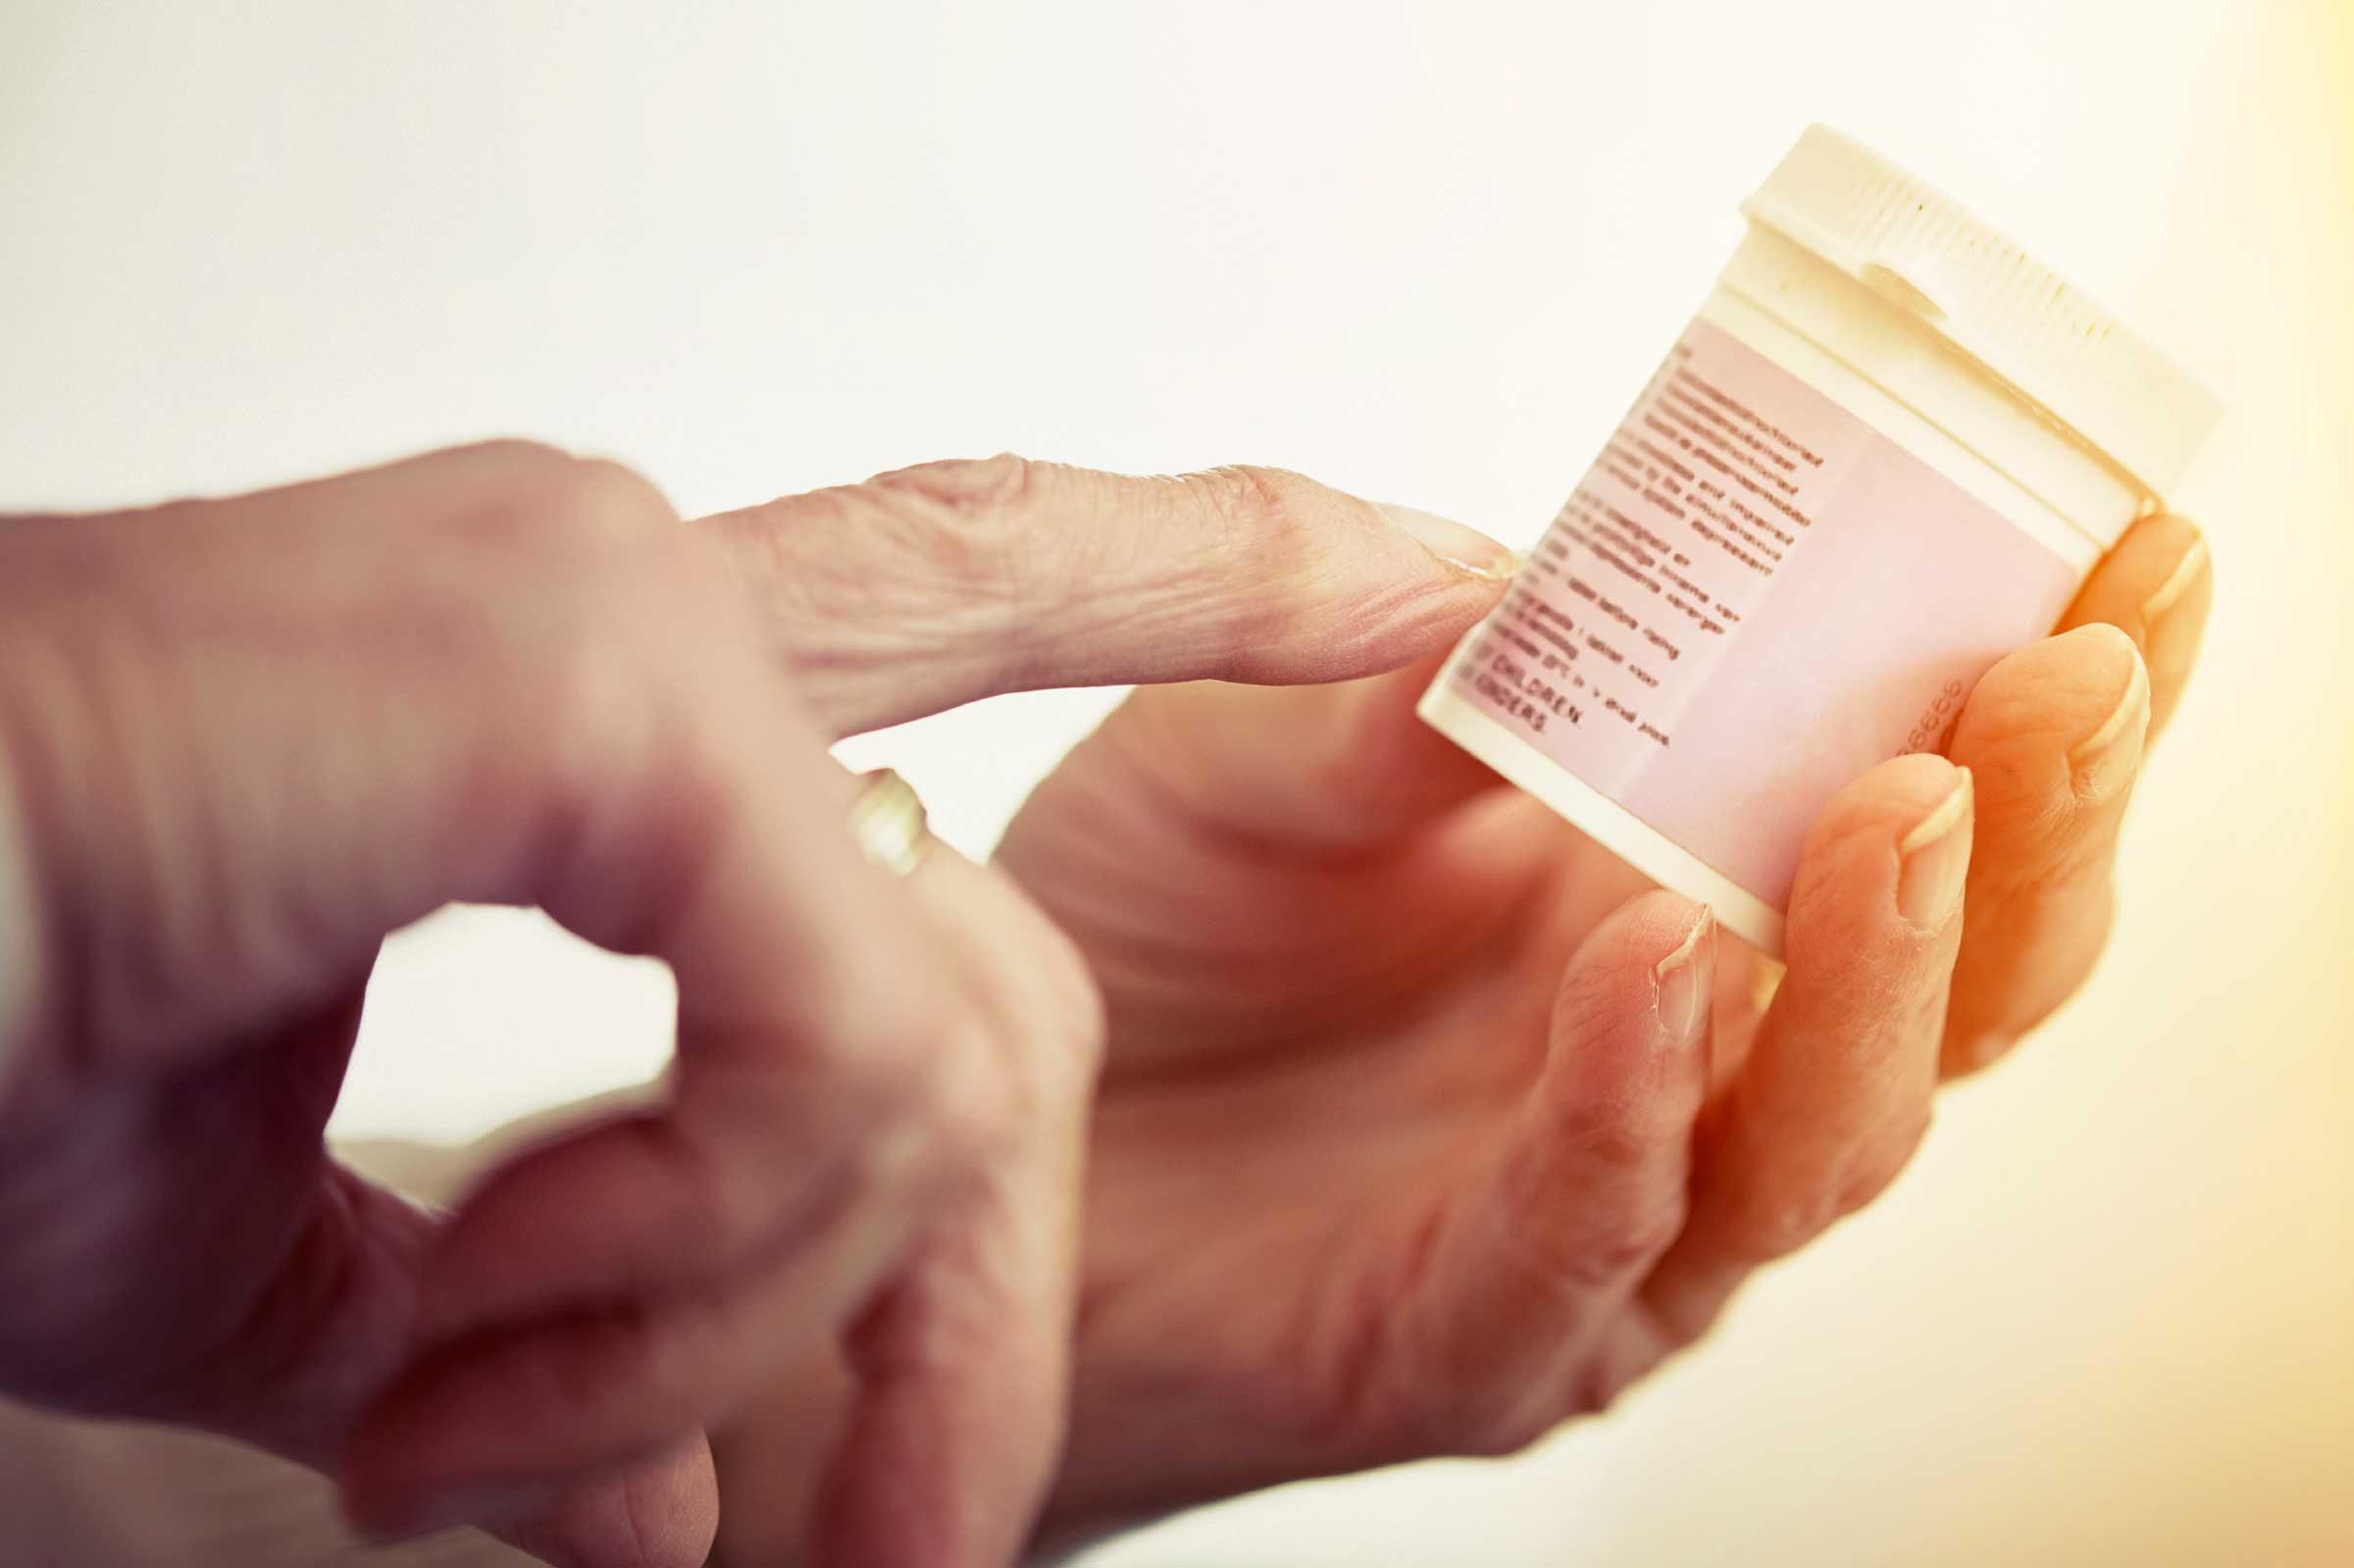 Make sure your medication treats your symptoms